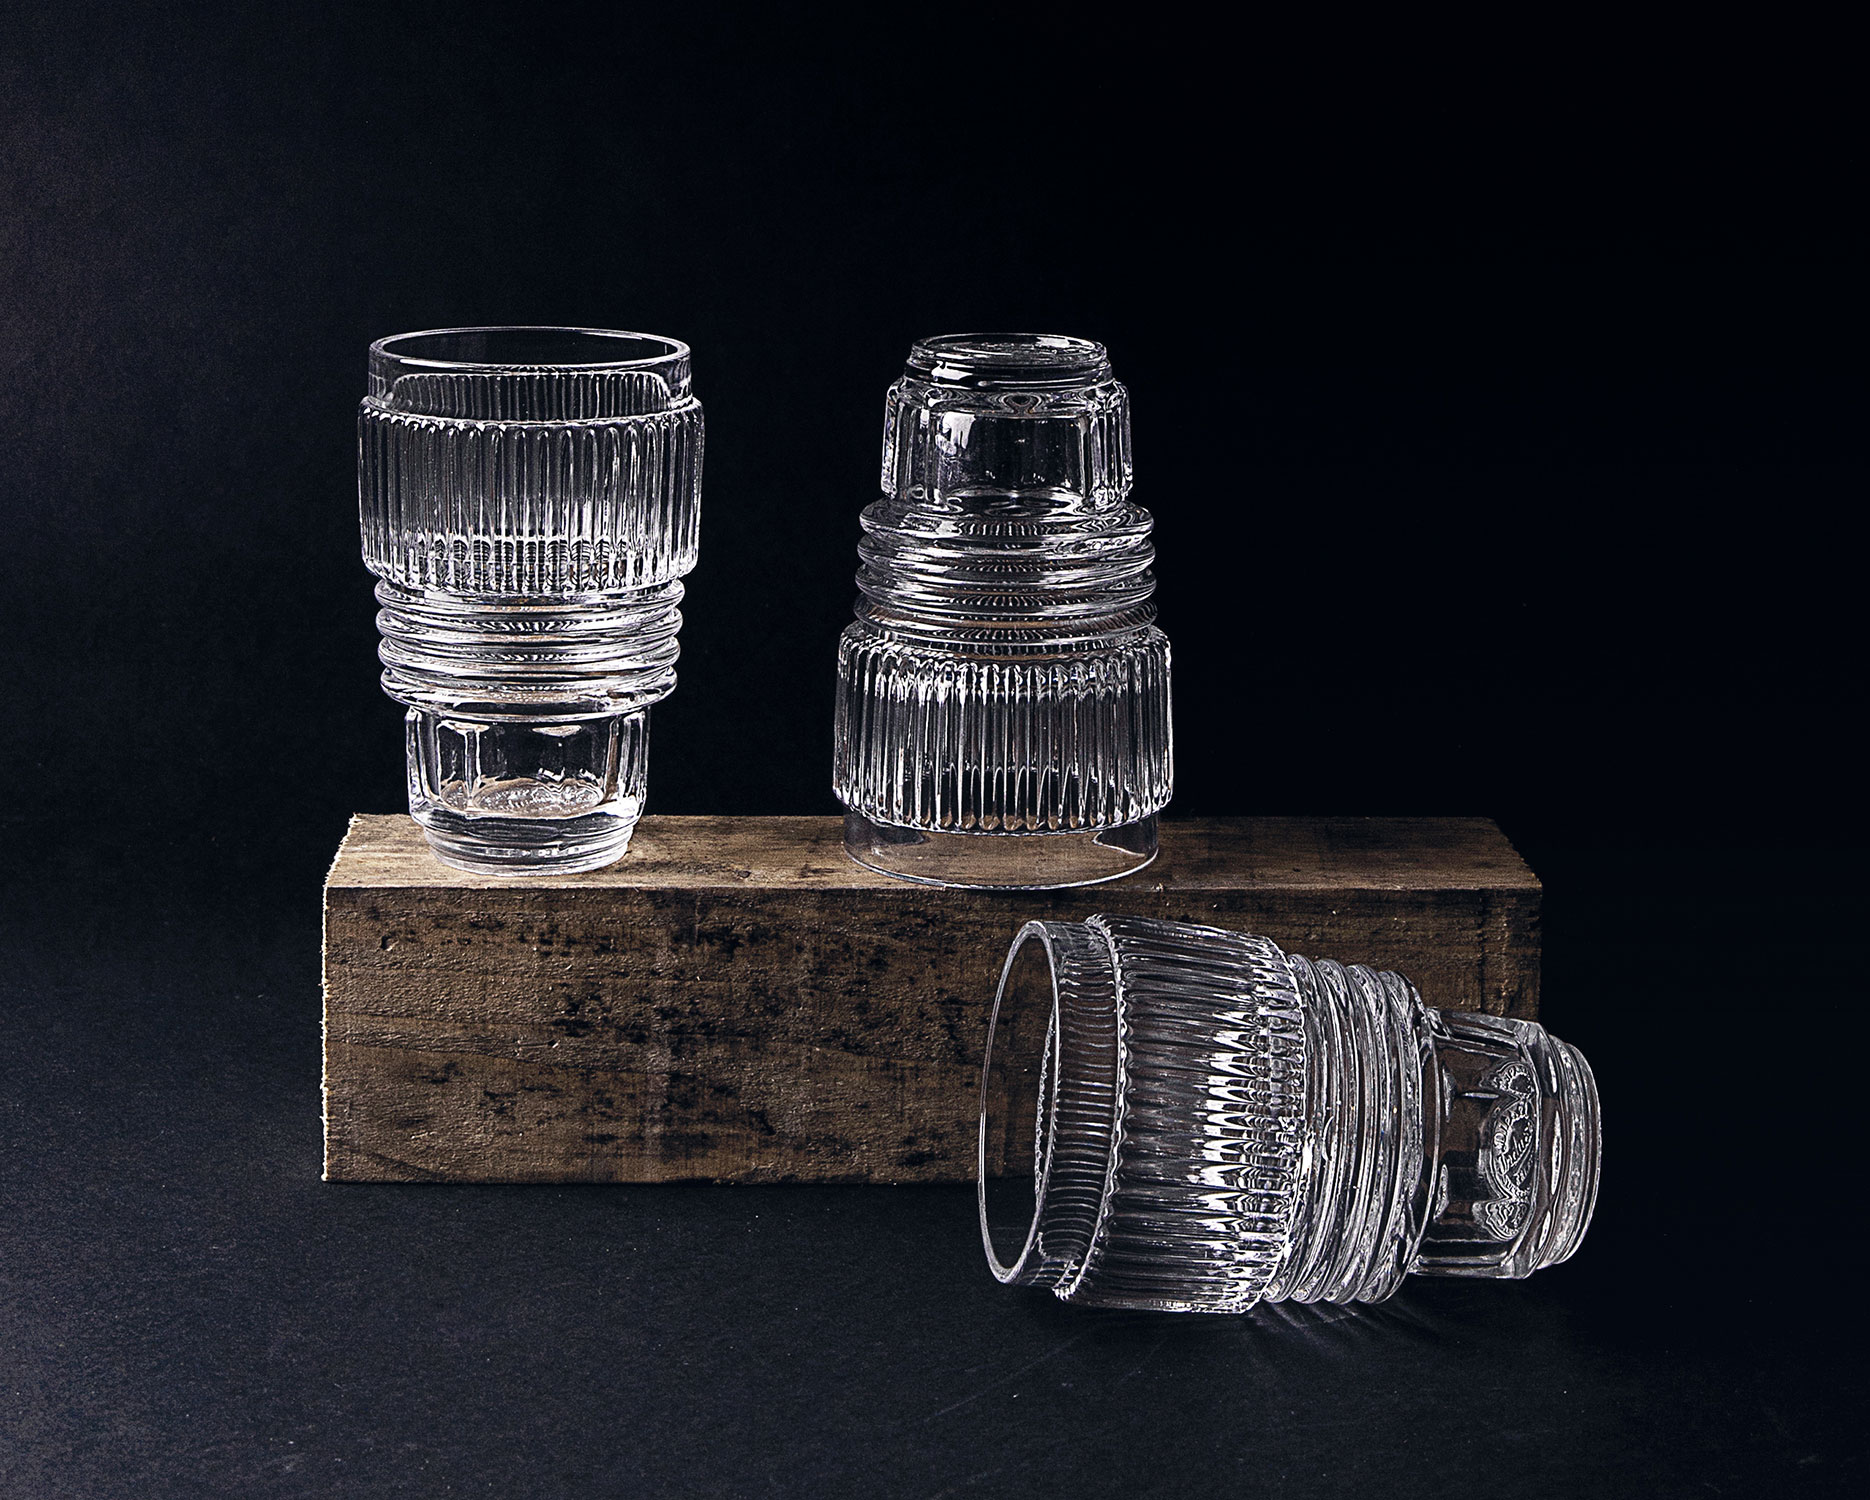 Set of 3 Glasses - Large